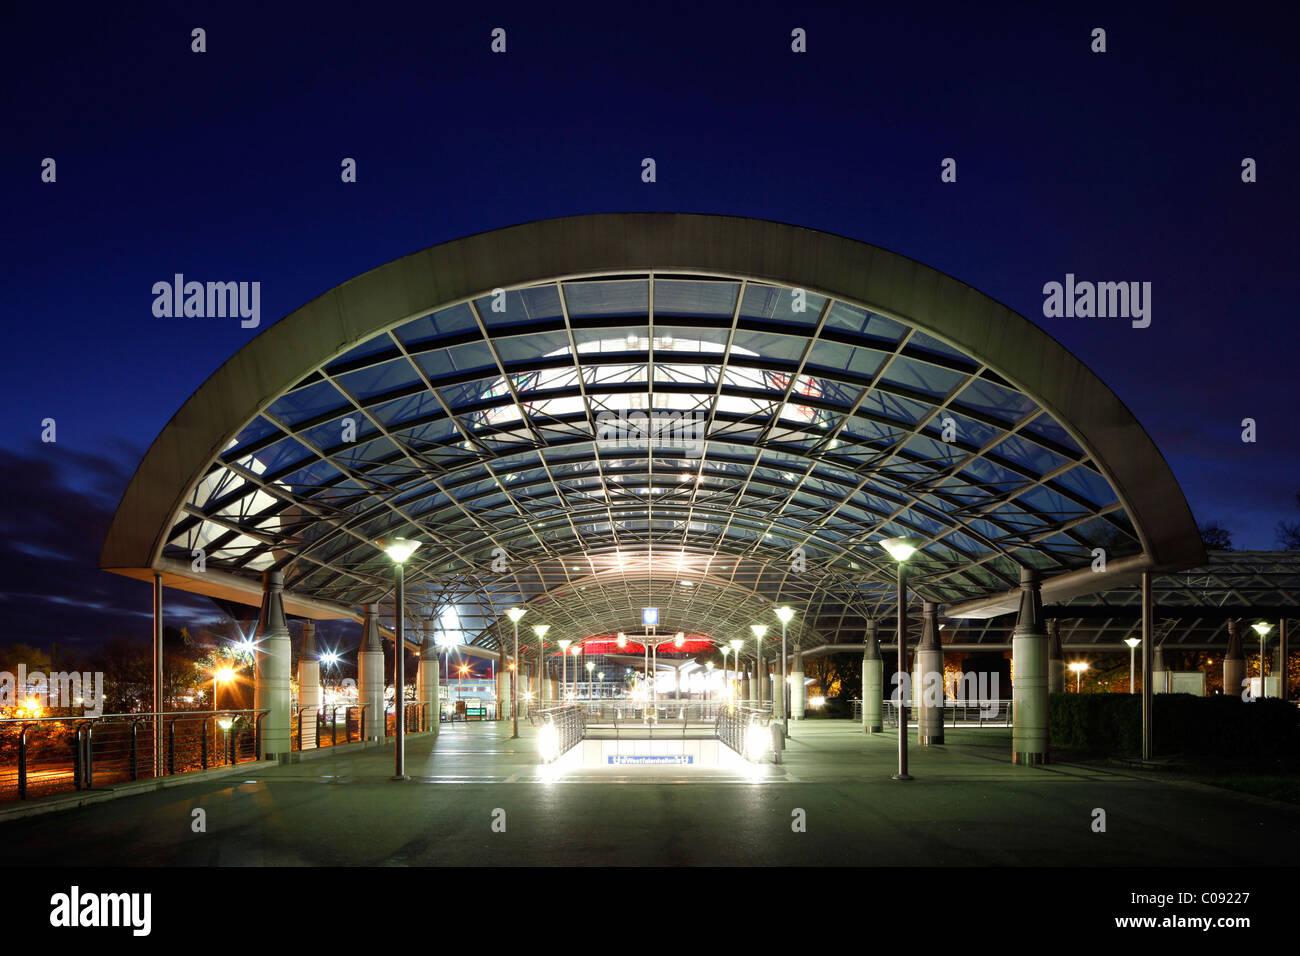 City railway station Westfalenhallen, Dortmund, Ruhrgebiet region, North Rhine-Westphalia, Germany, Europe - Stock Image